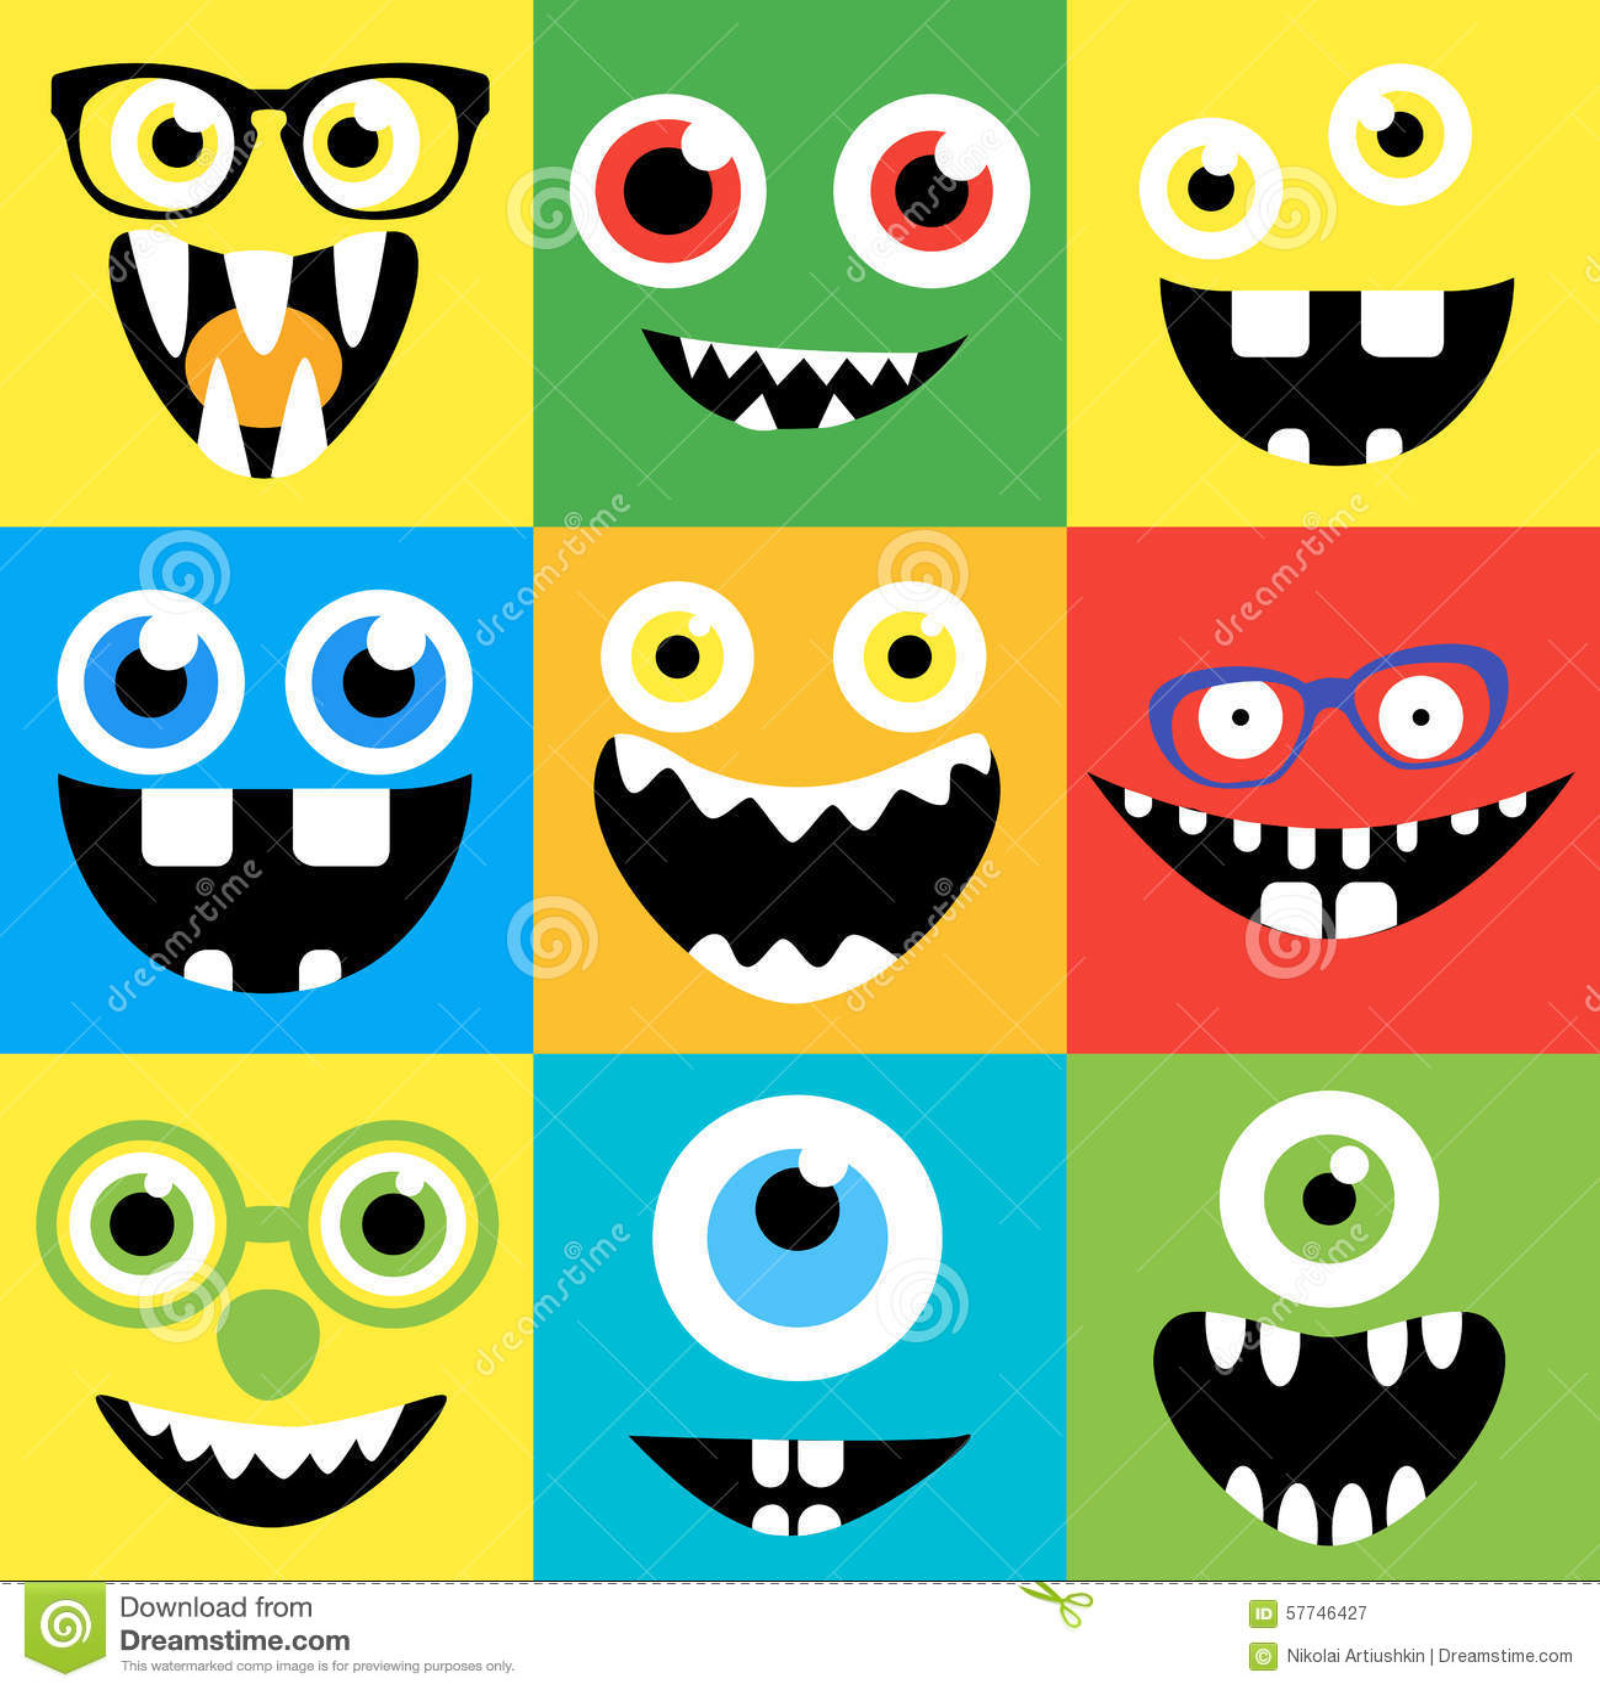 Colorful Animal Print Wallpaper Cartoon Monster Faces Vector Set Cute Square Stock Vector